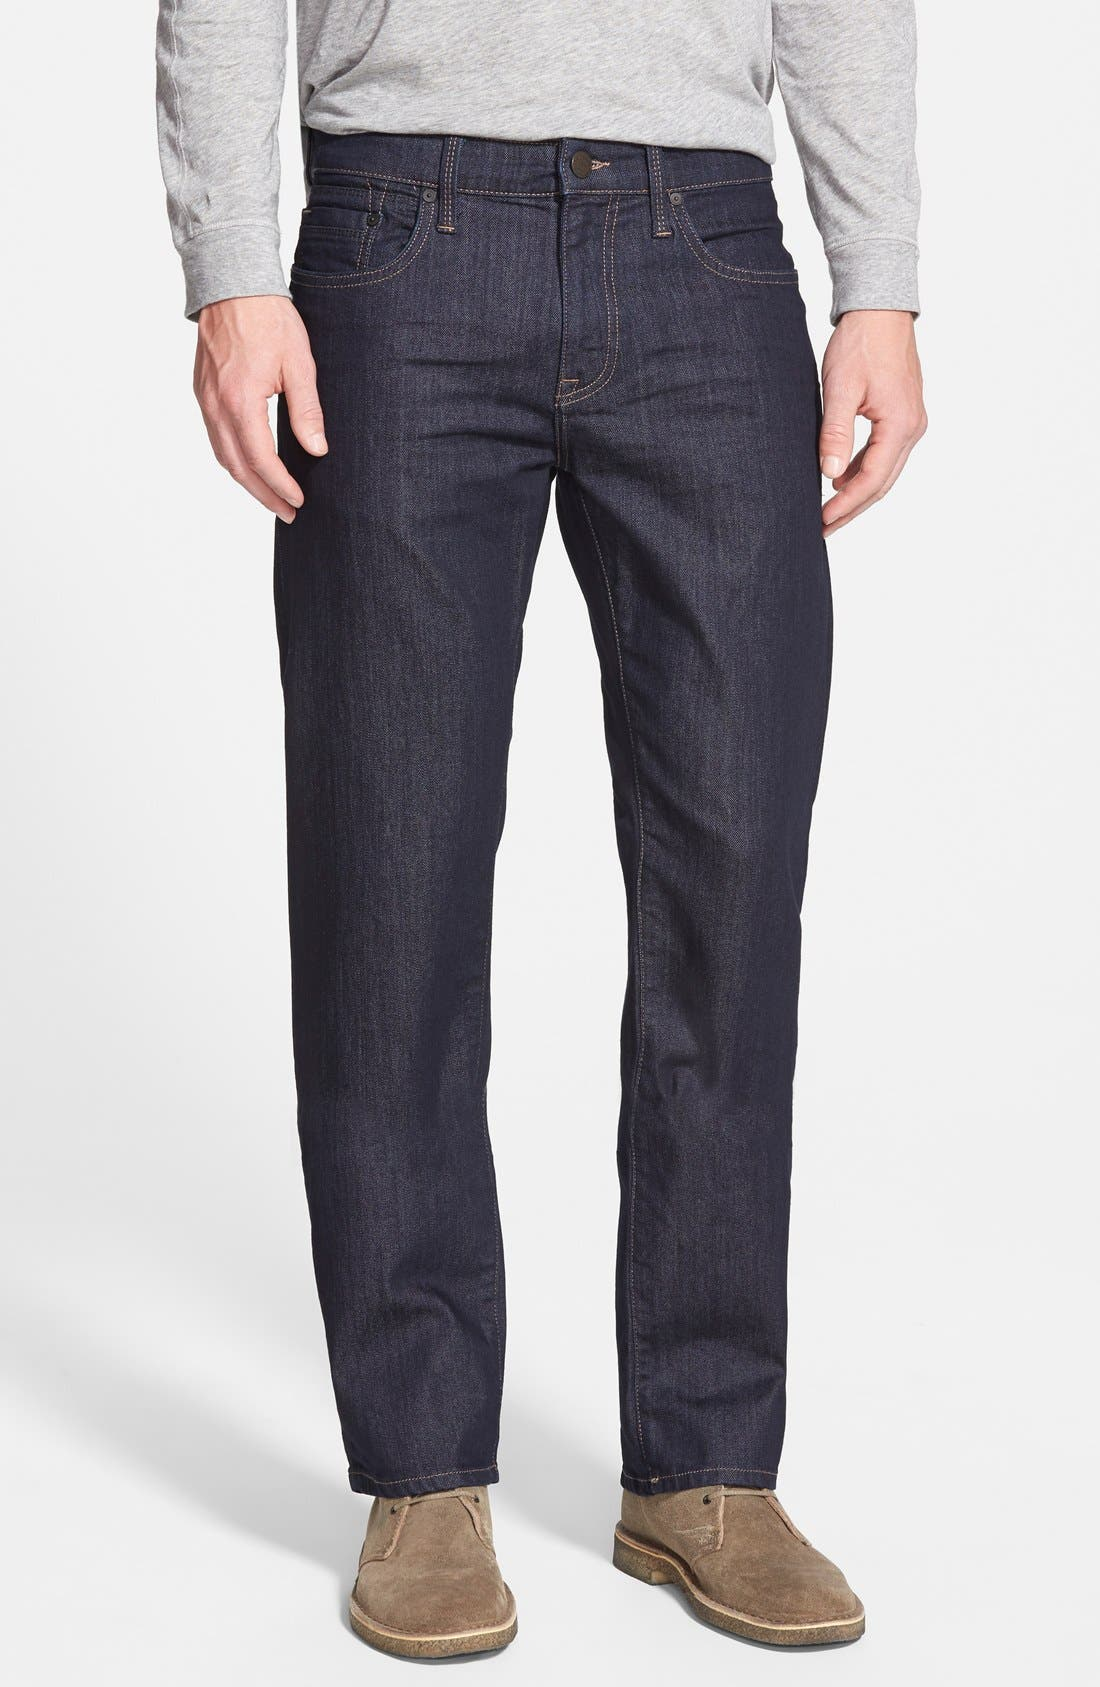 Zach Straight Leg Jeans,                             Main thumbnail 1, color,                             RINSE WILLIAMSBURG